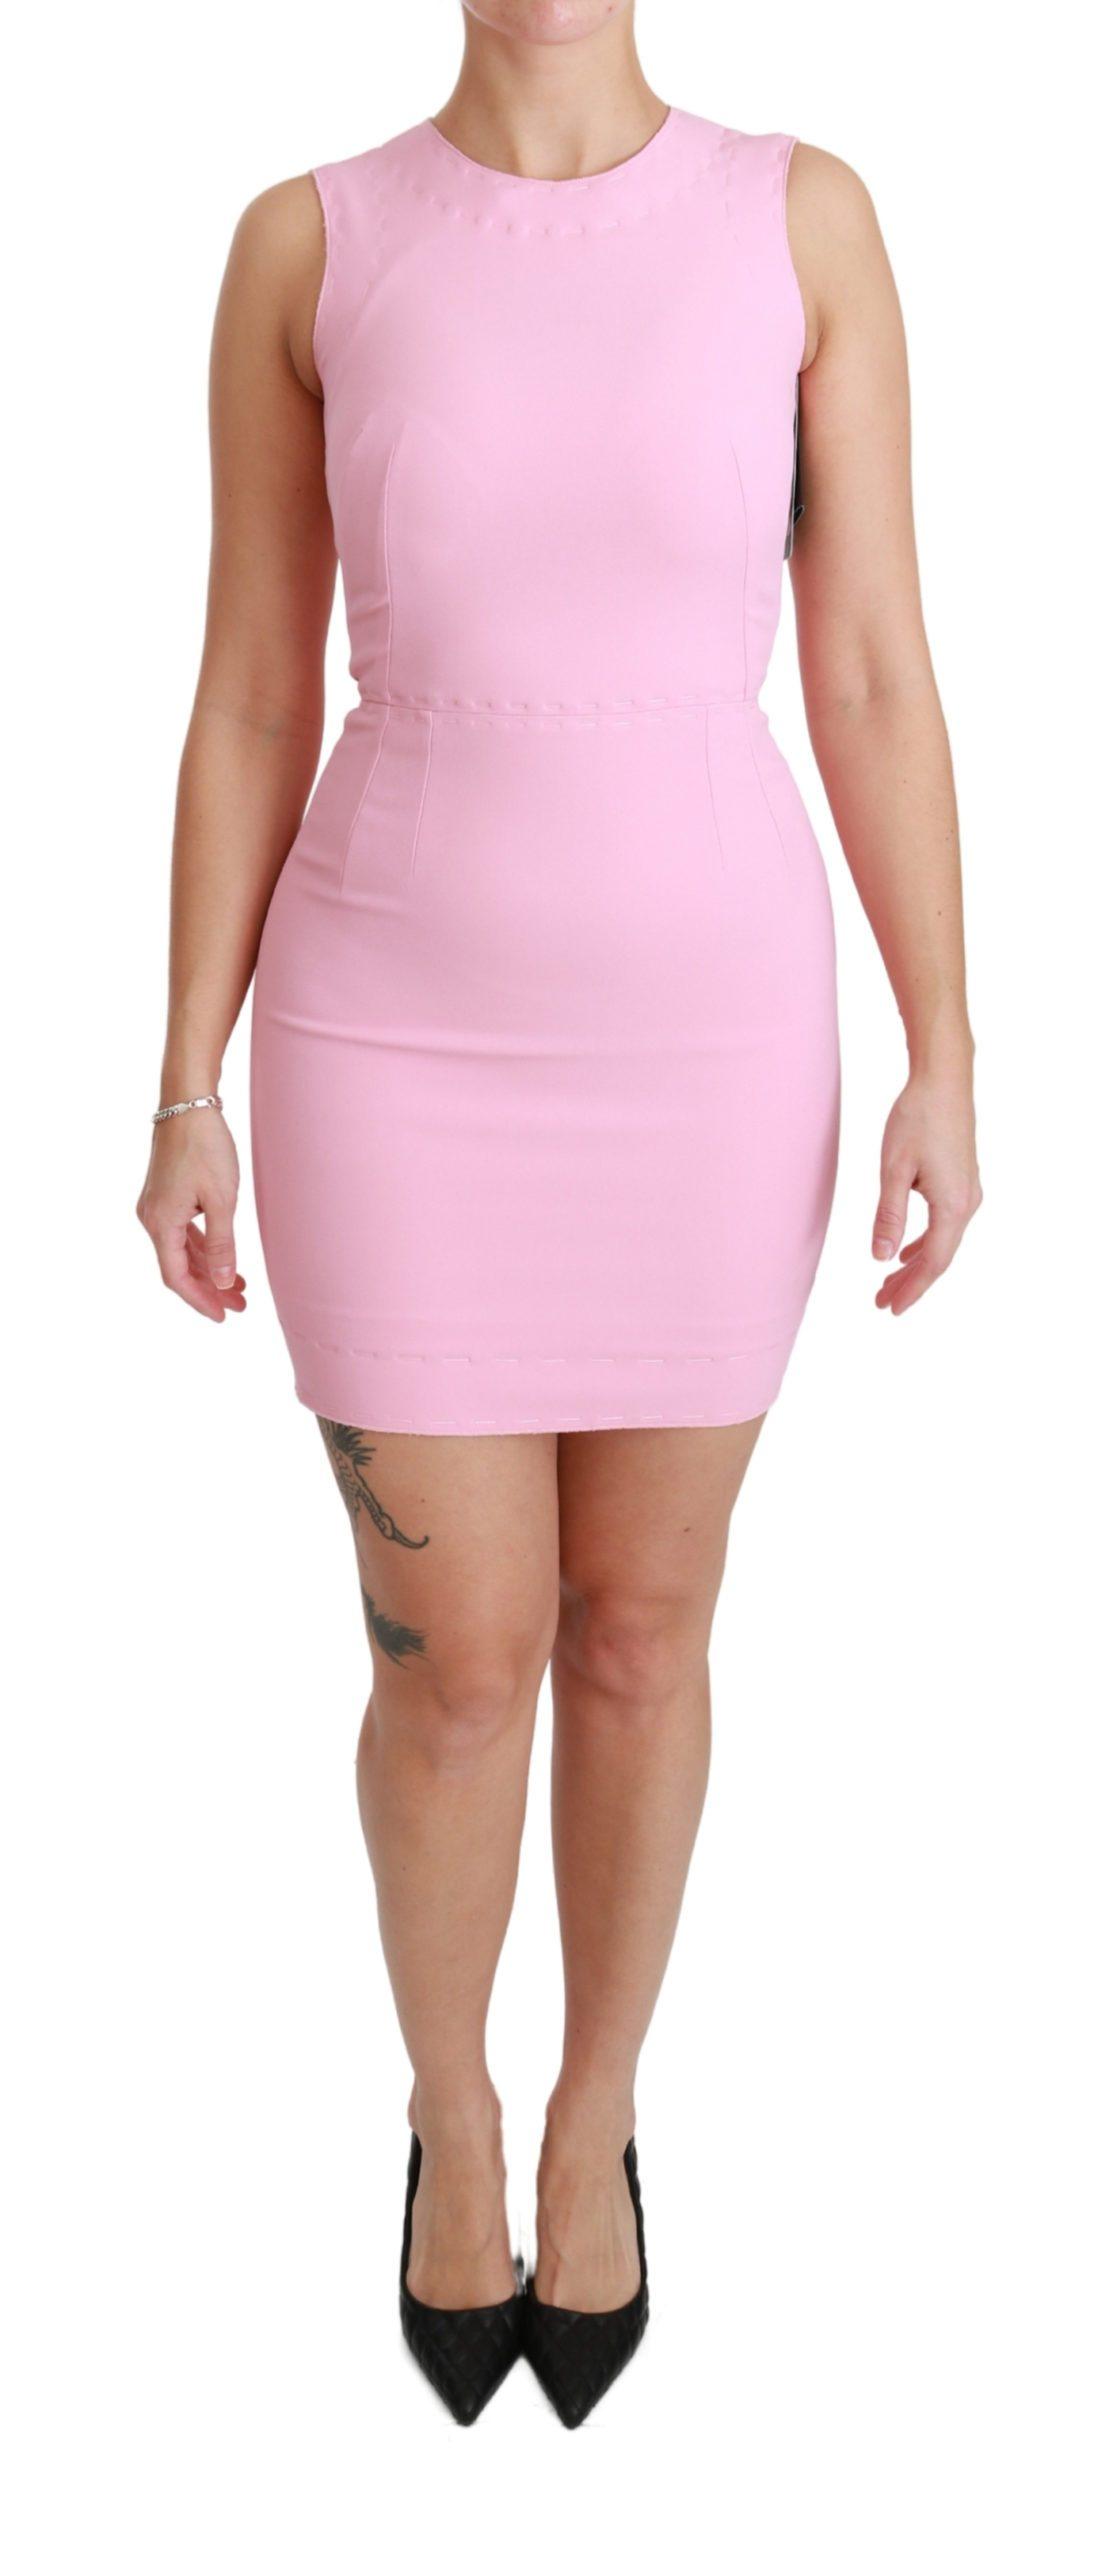 Dolce & Gabbana Women's Stretch Sheath Mini Dress Pink DR2463 - IT36 | XS